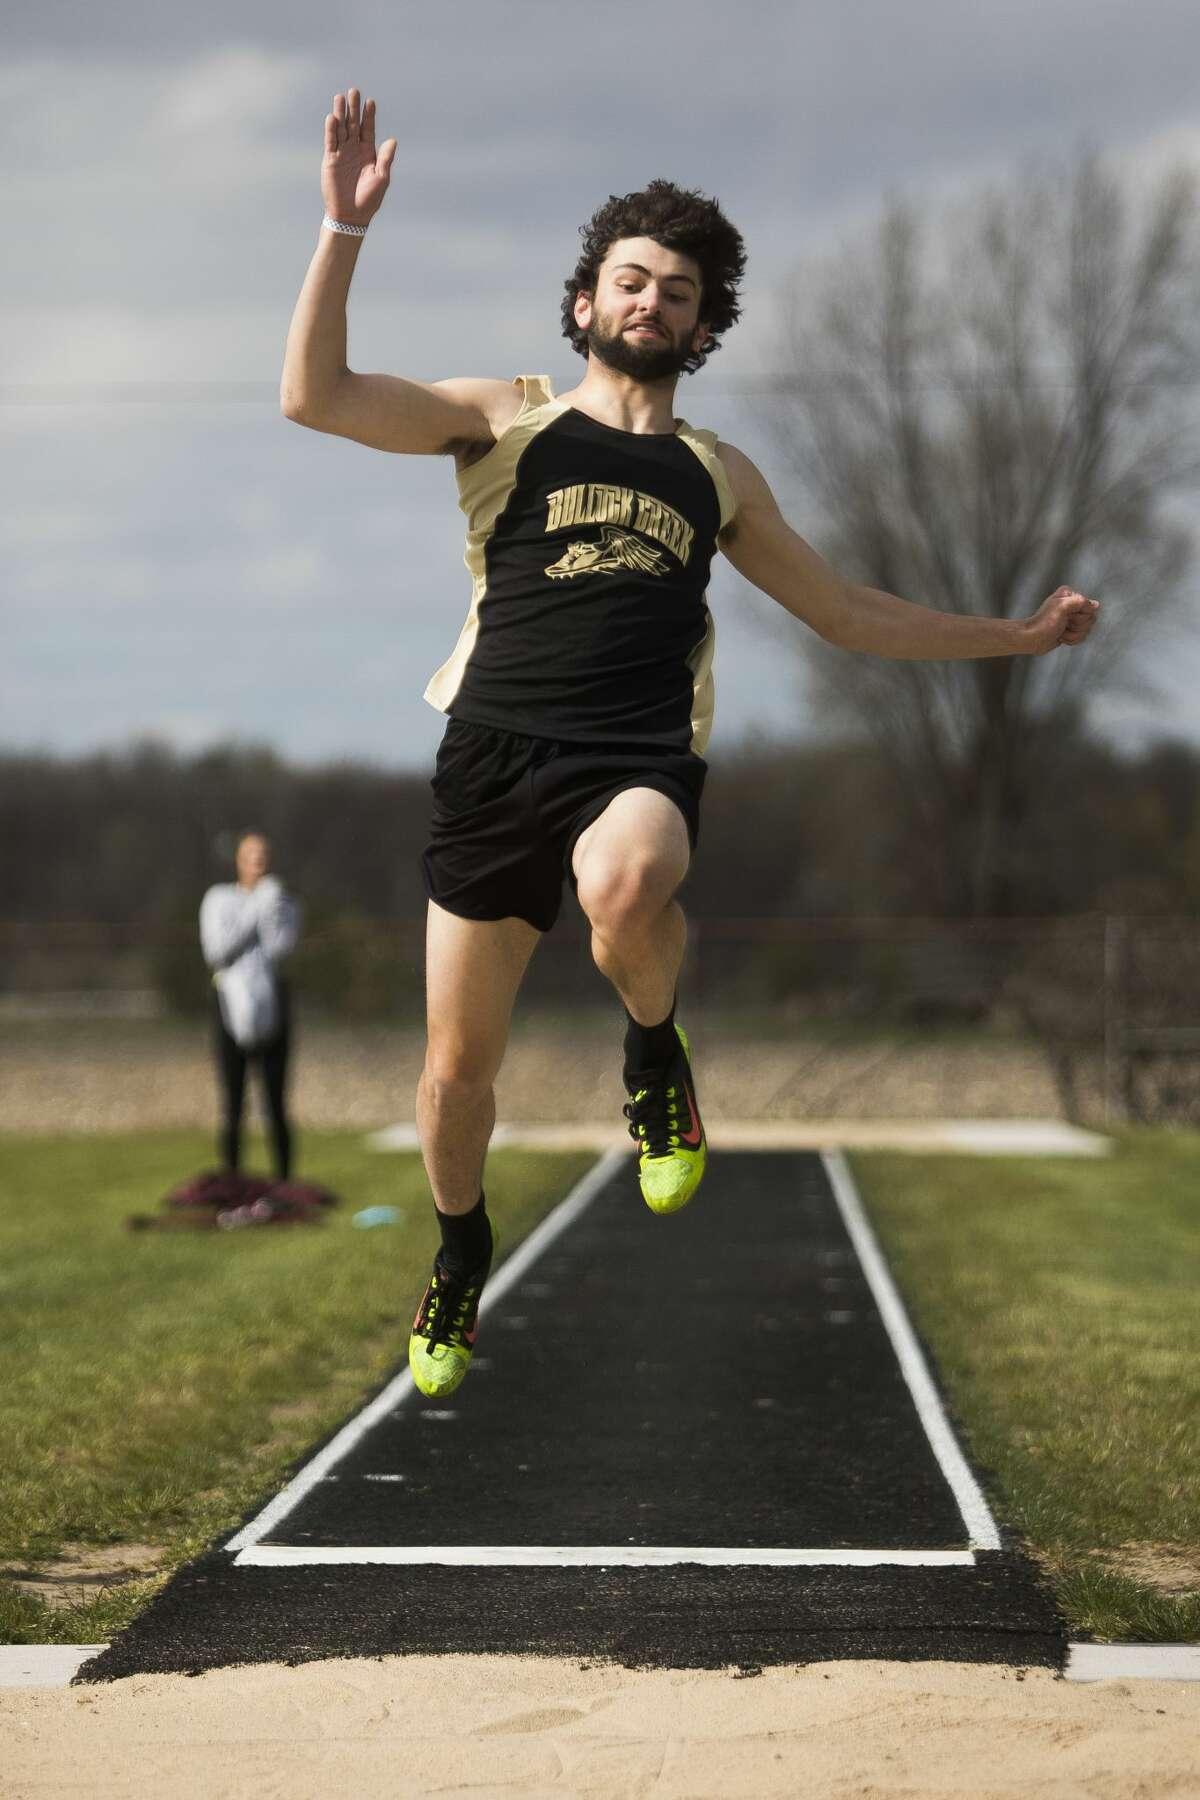 Bullock Creek's Brandon Fowler competes in the long jump event during a track meet Wednesday, April 21, 2021 at Bullock Creek High School. (Katy Kildee/kkildee@mdn.net)